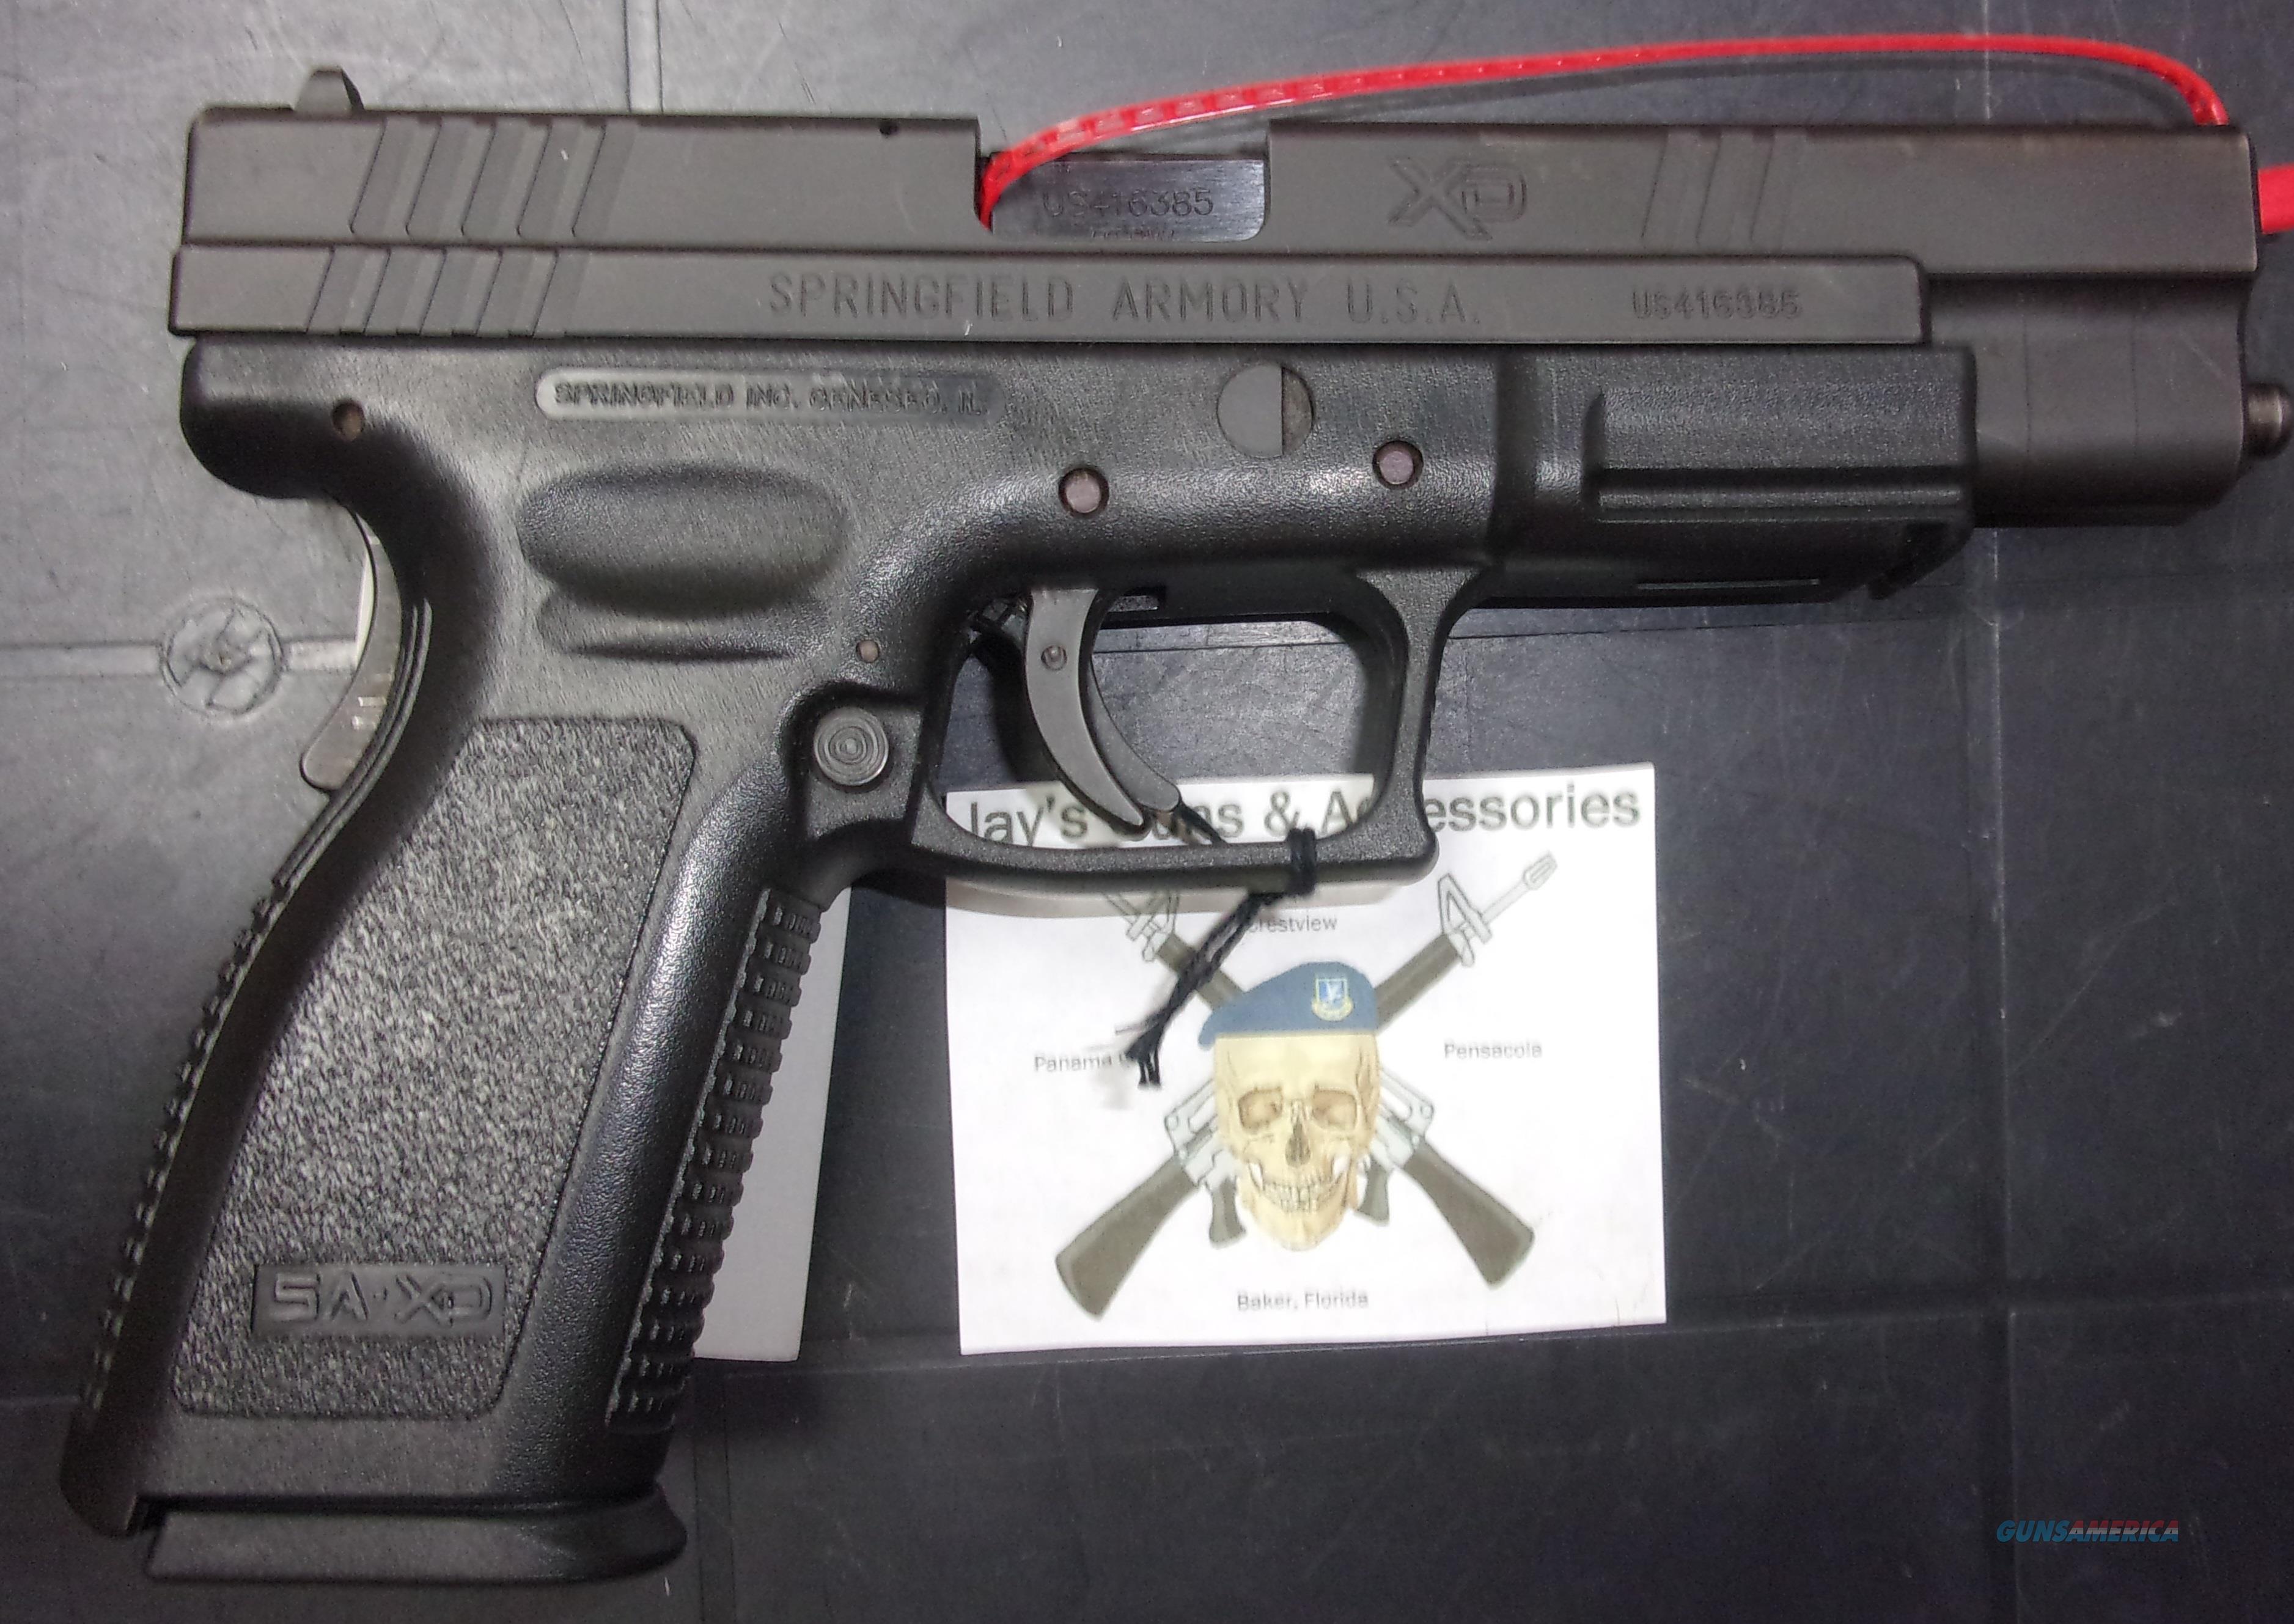 Springfield Armory XD-40 Tactical  Guns > Pistols > Springfield Armory Pistols > XD (eXtreme Duty)